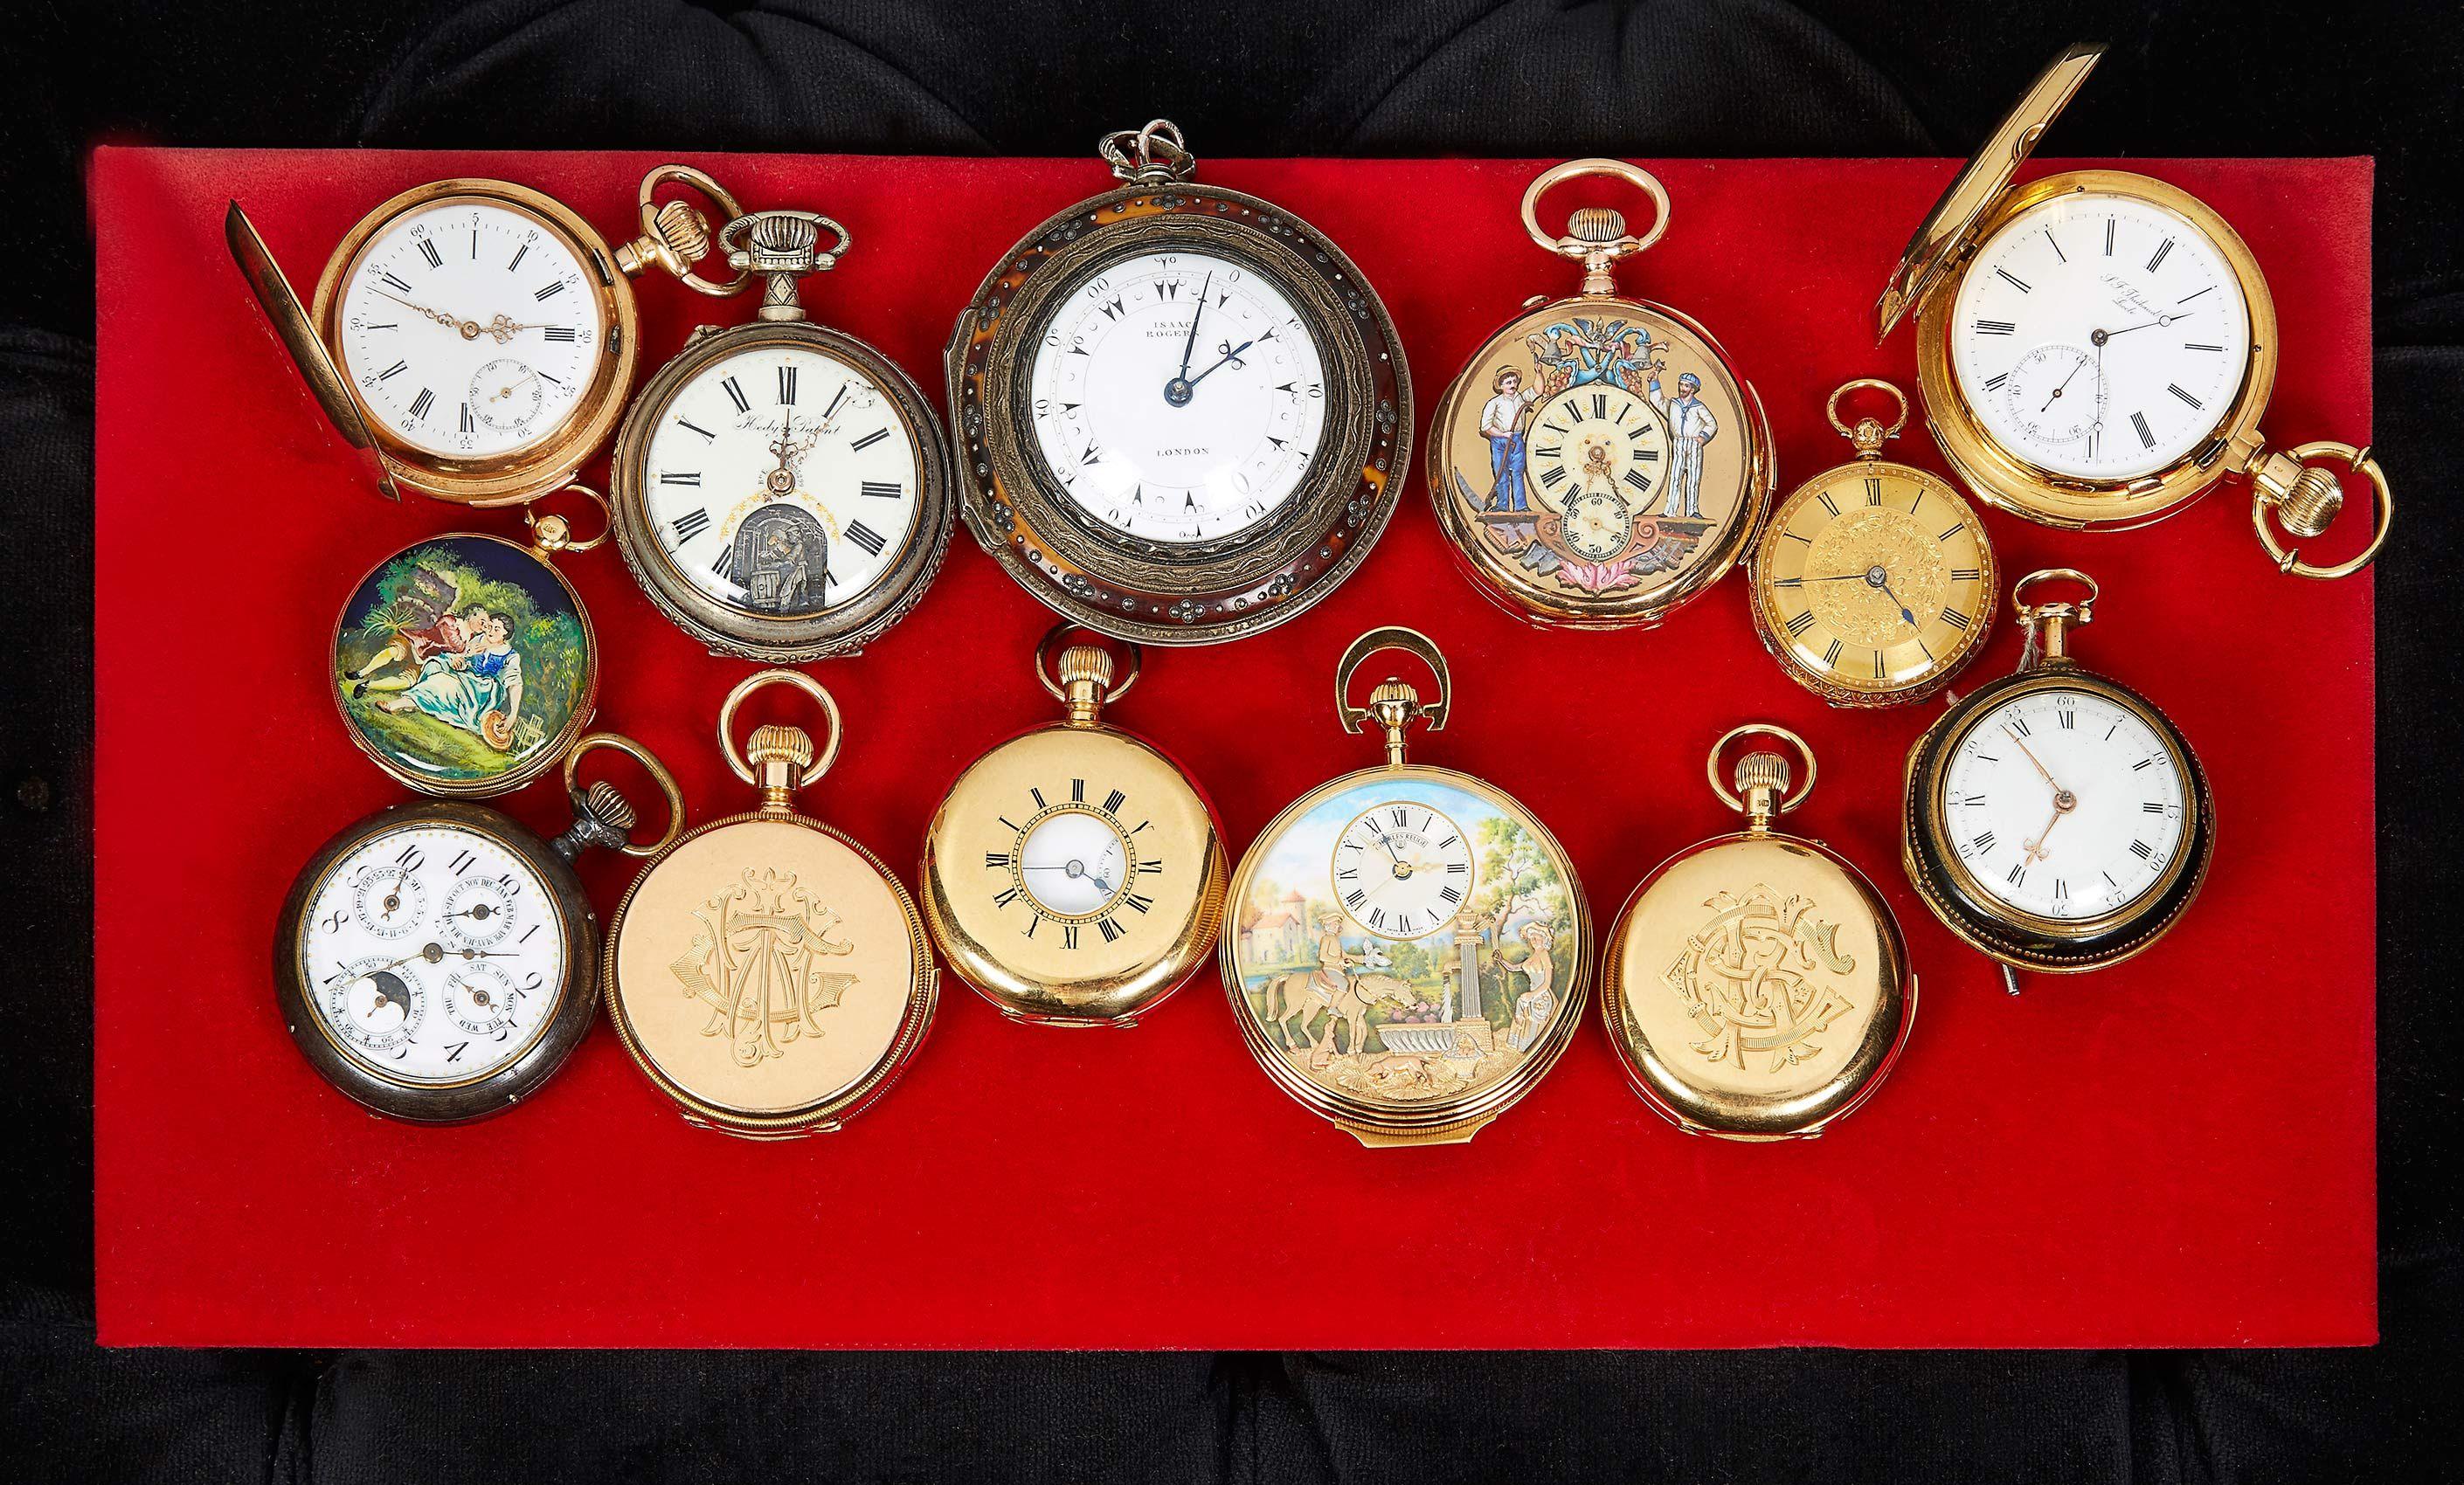 Rare, vintage pocket watches